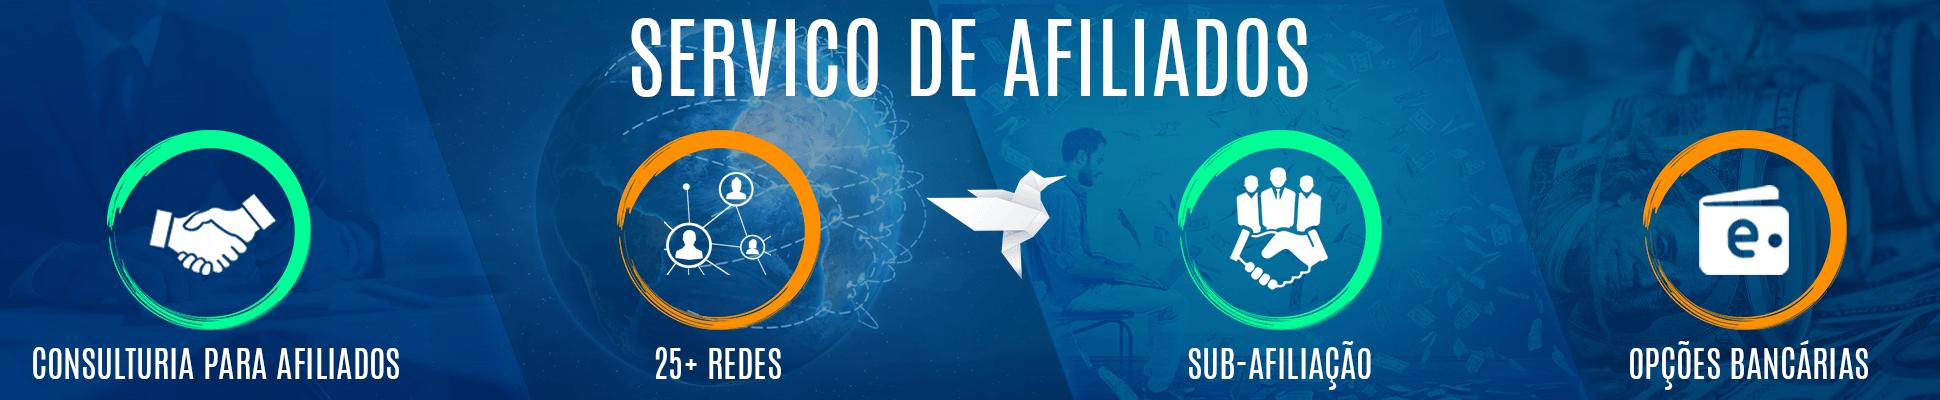 serviço-afiliados-brasil